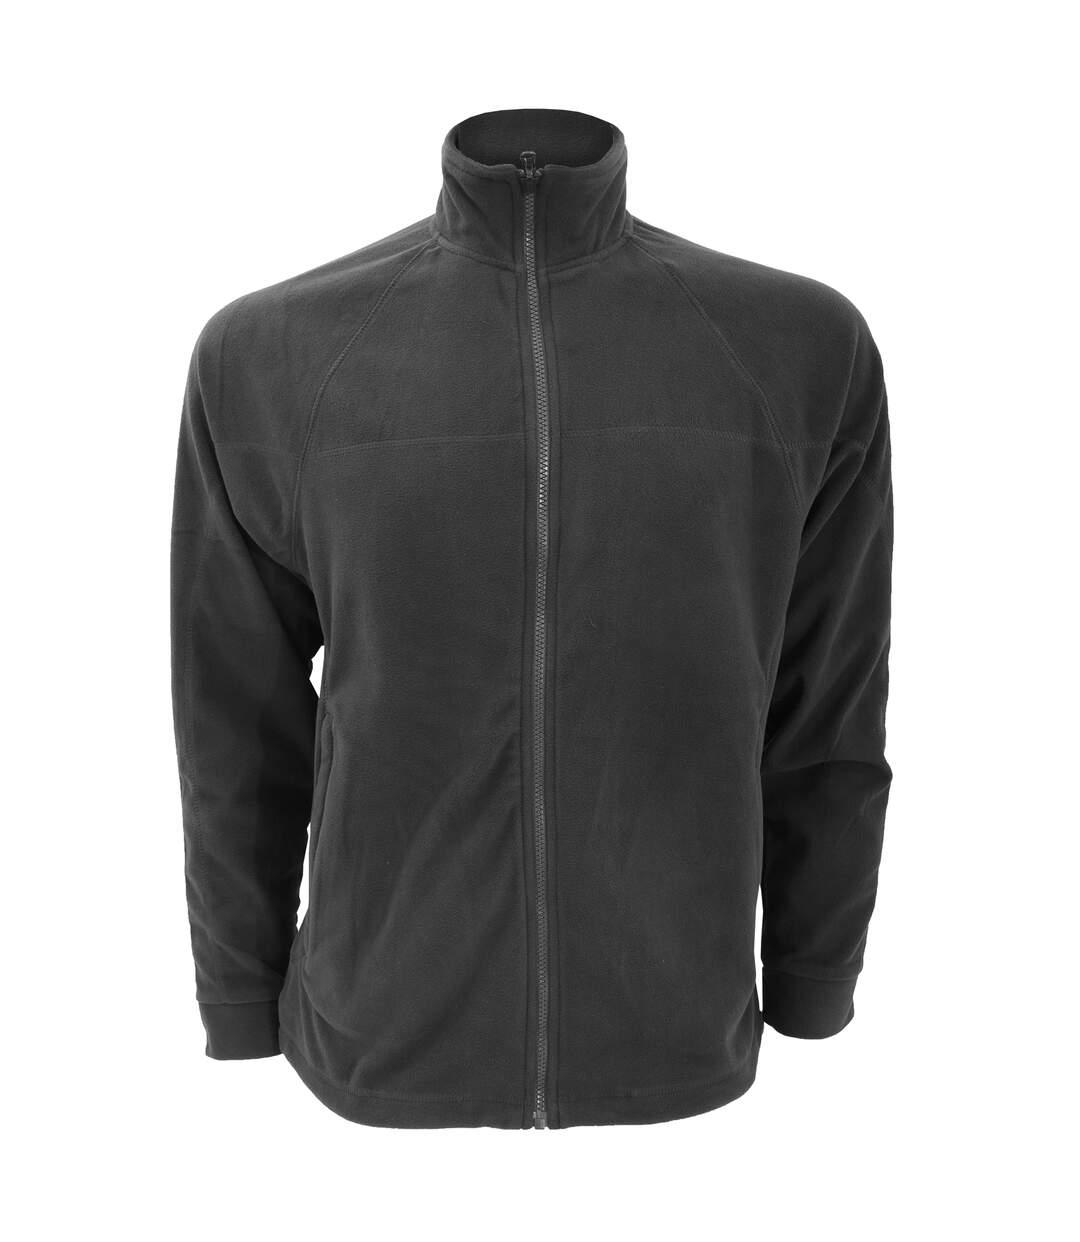 Craghoppers Mens Basecamp Microfleece FZ Full Zip Jacket (Black) - UTRW367